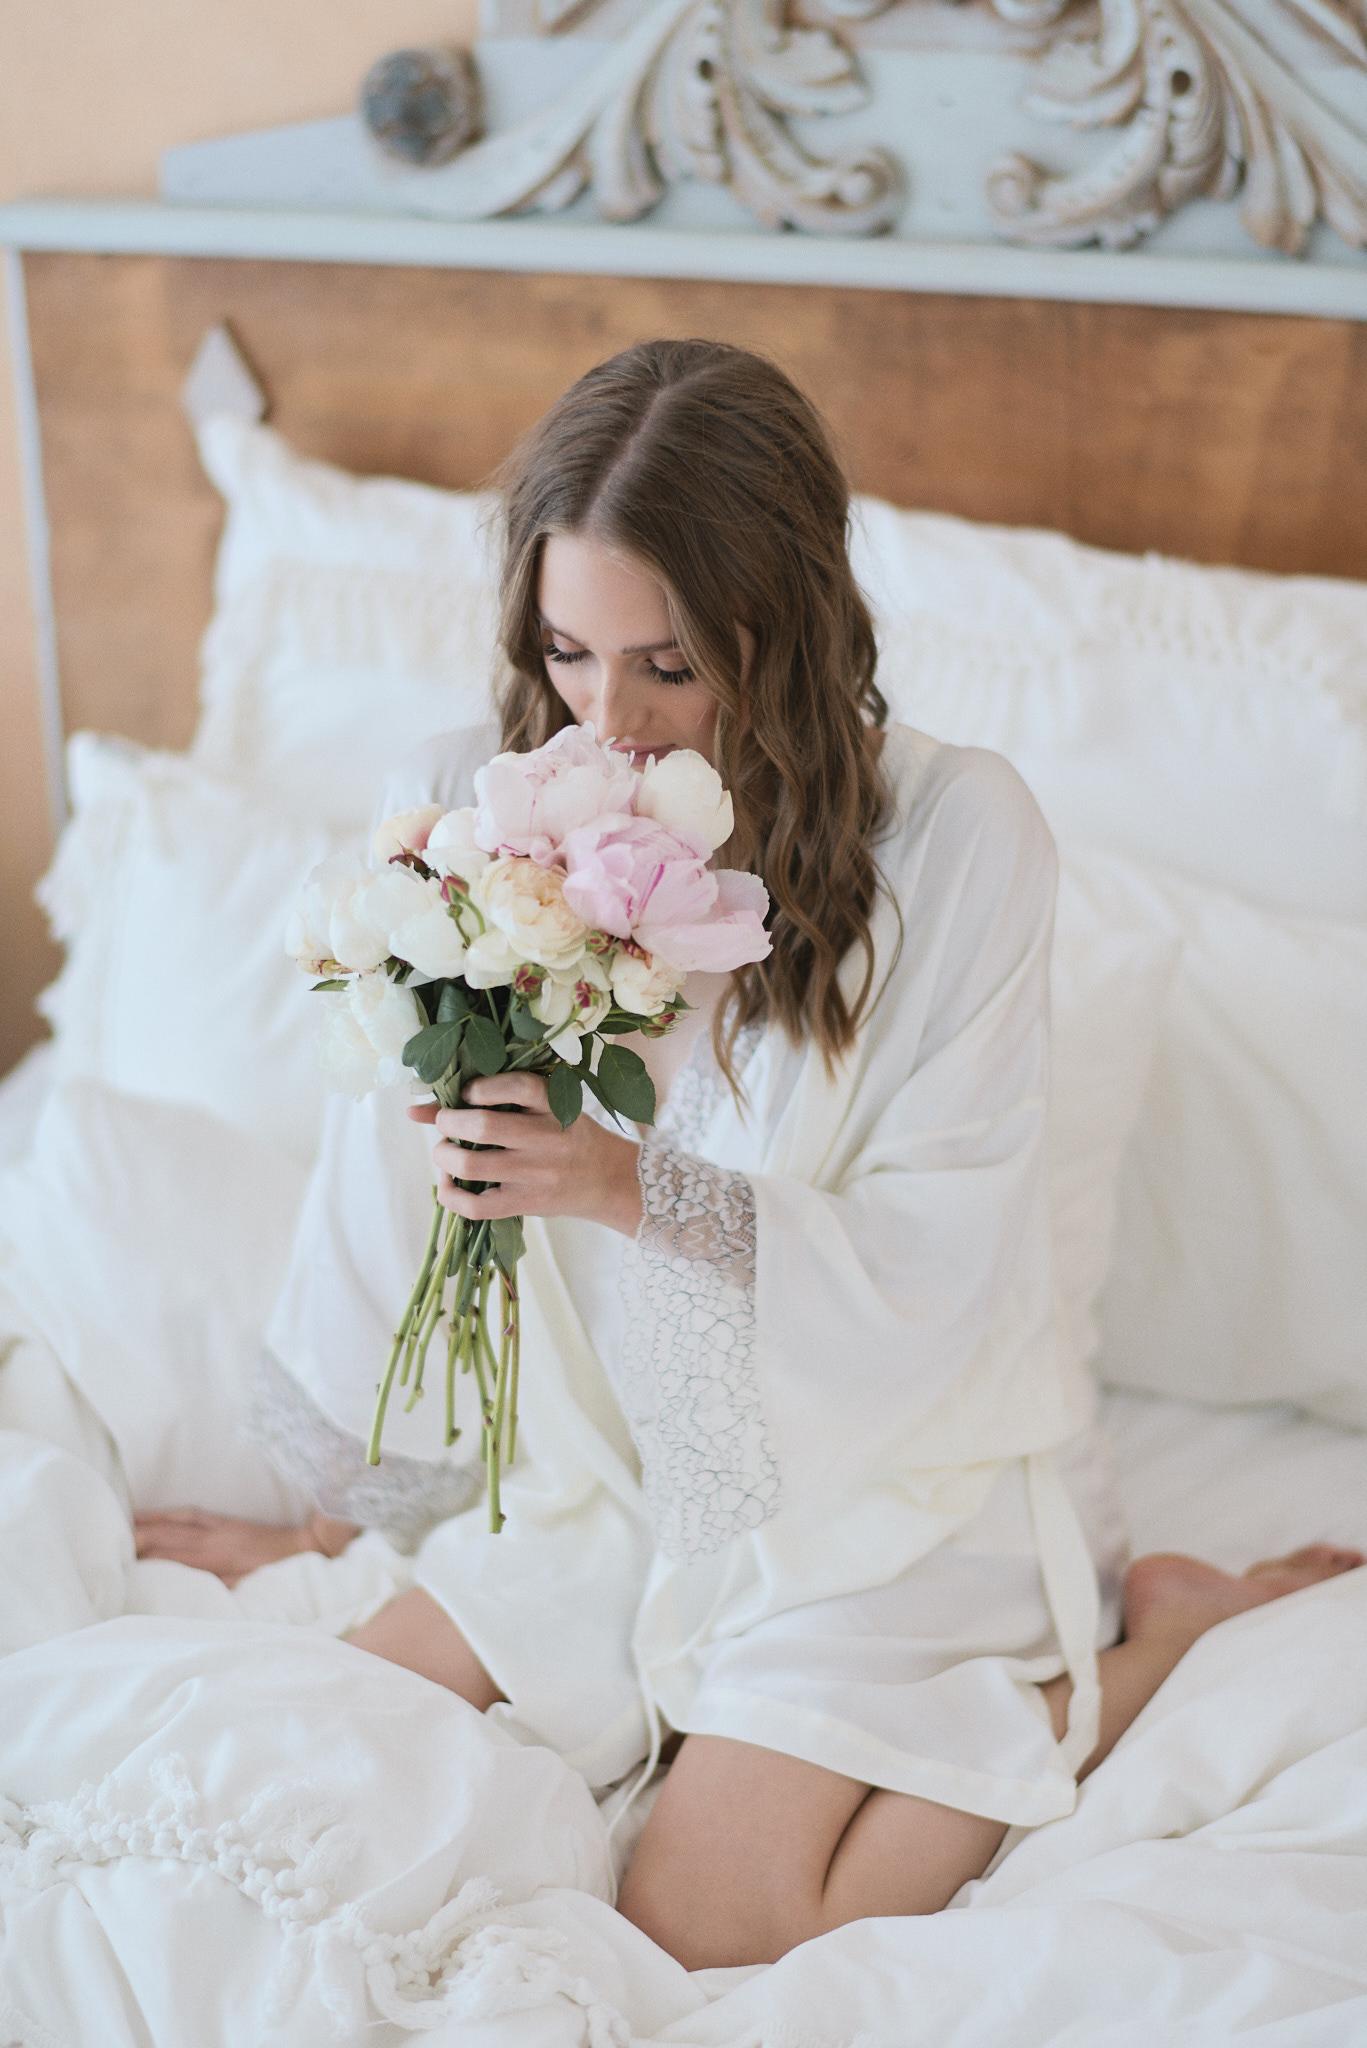 Sephory Photography - Romance is not dead 005 - Web.jpg